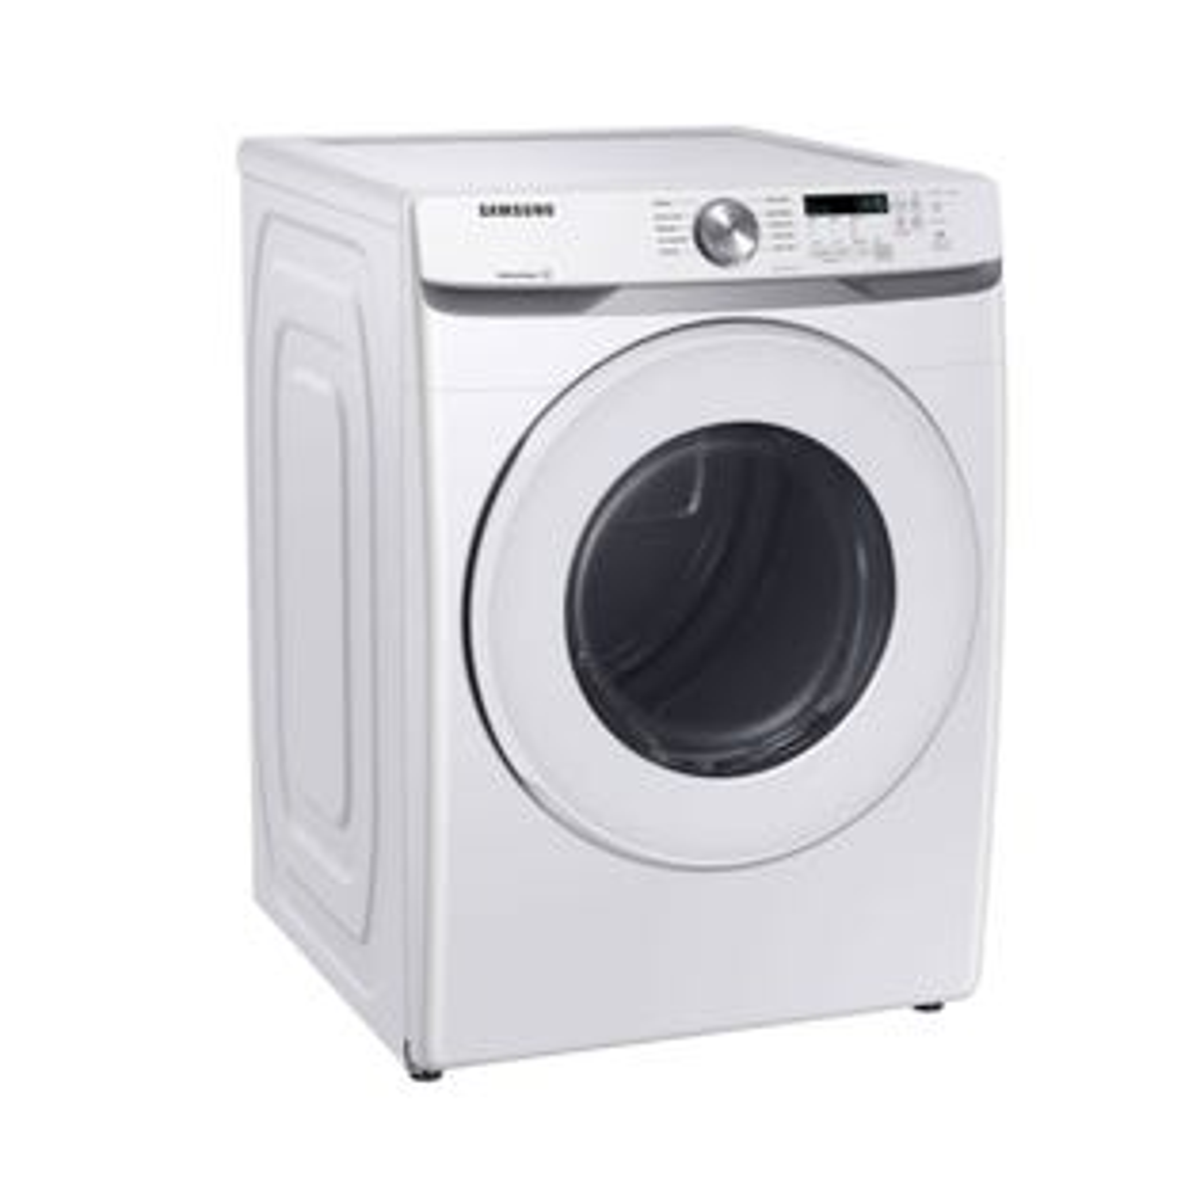 Samsung 7.5 Cu Ft Electric Dryer DVE45T6005W